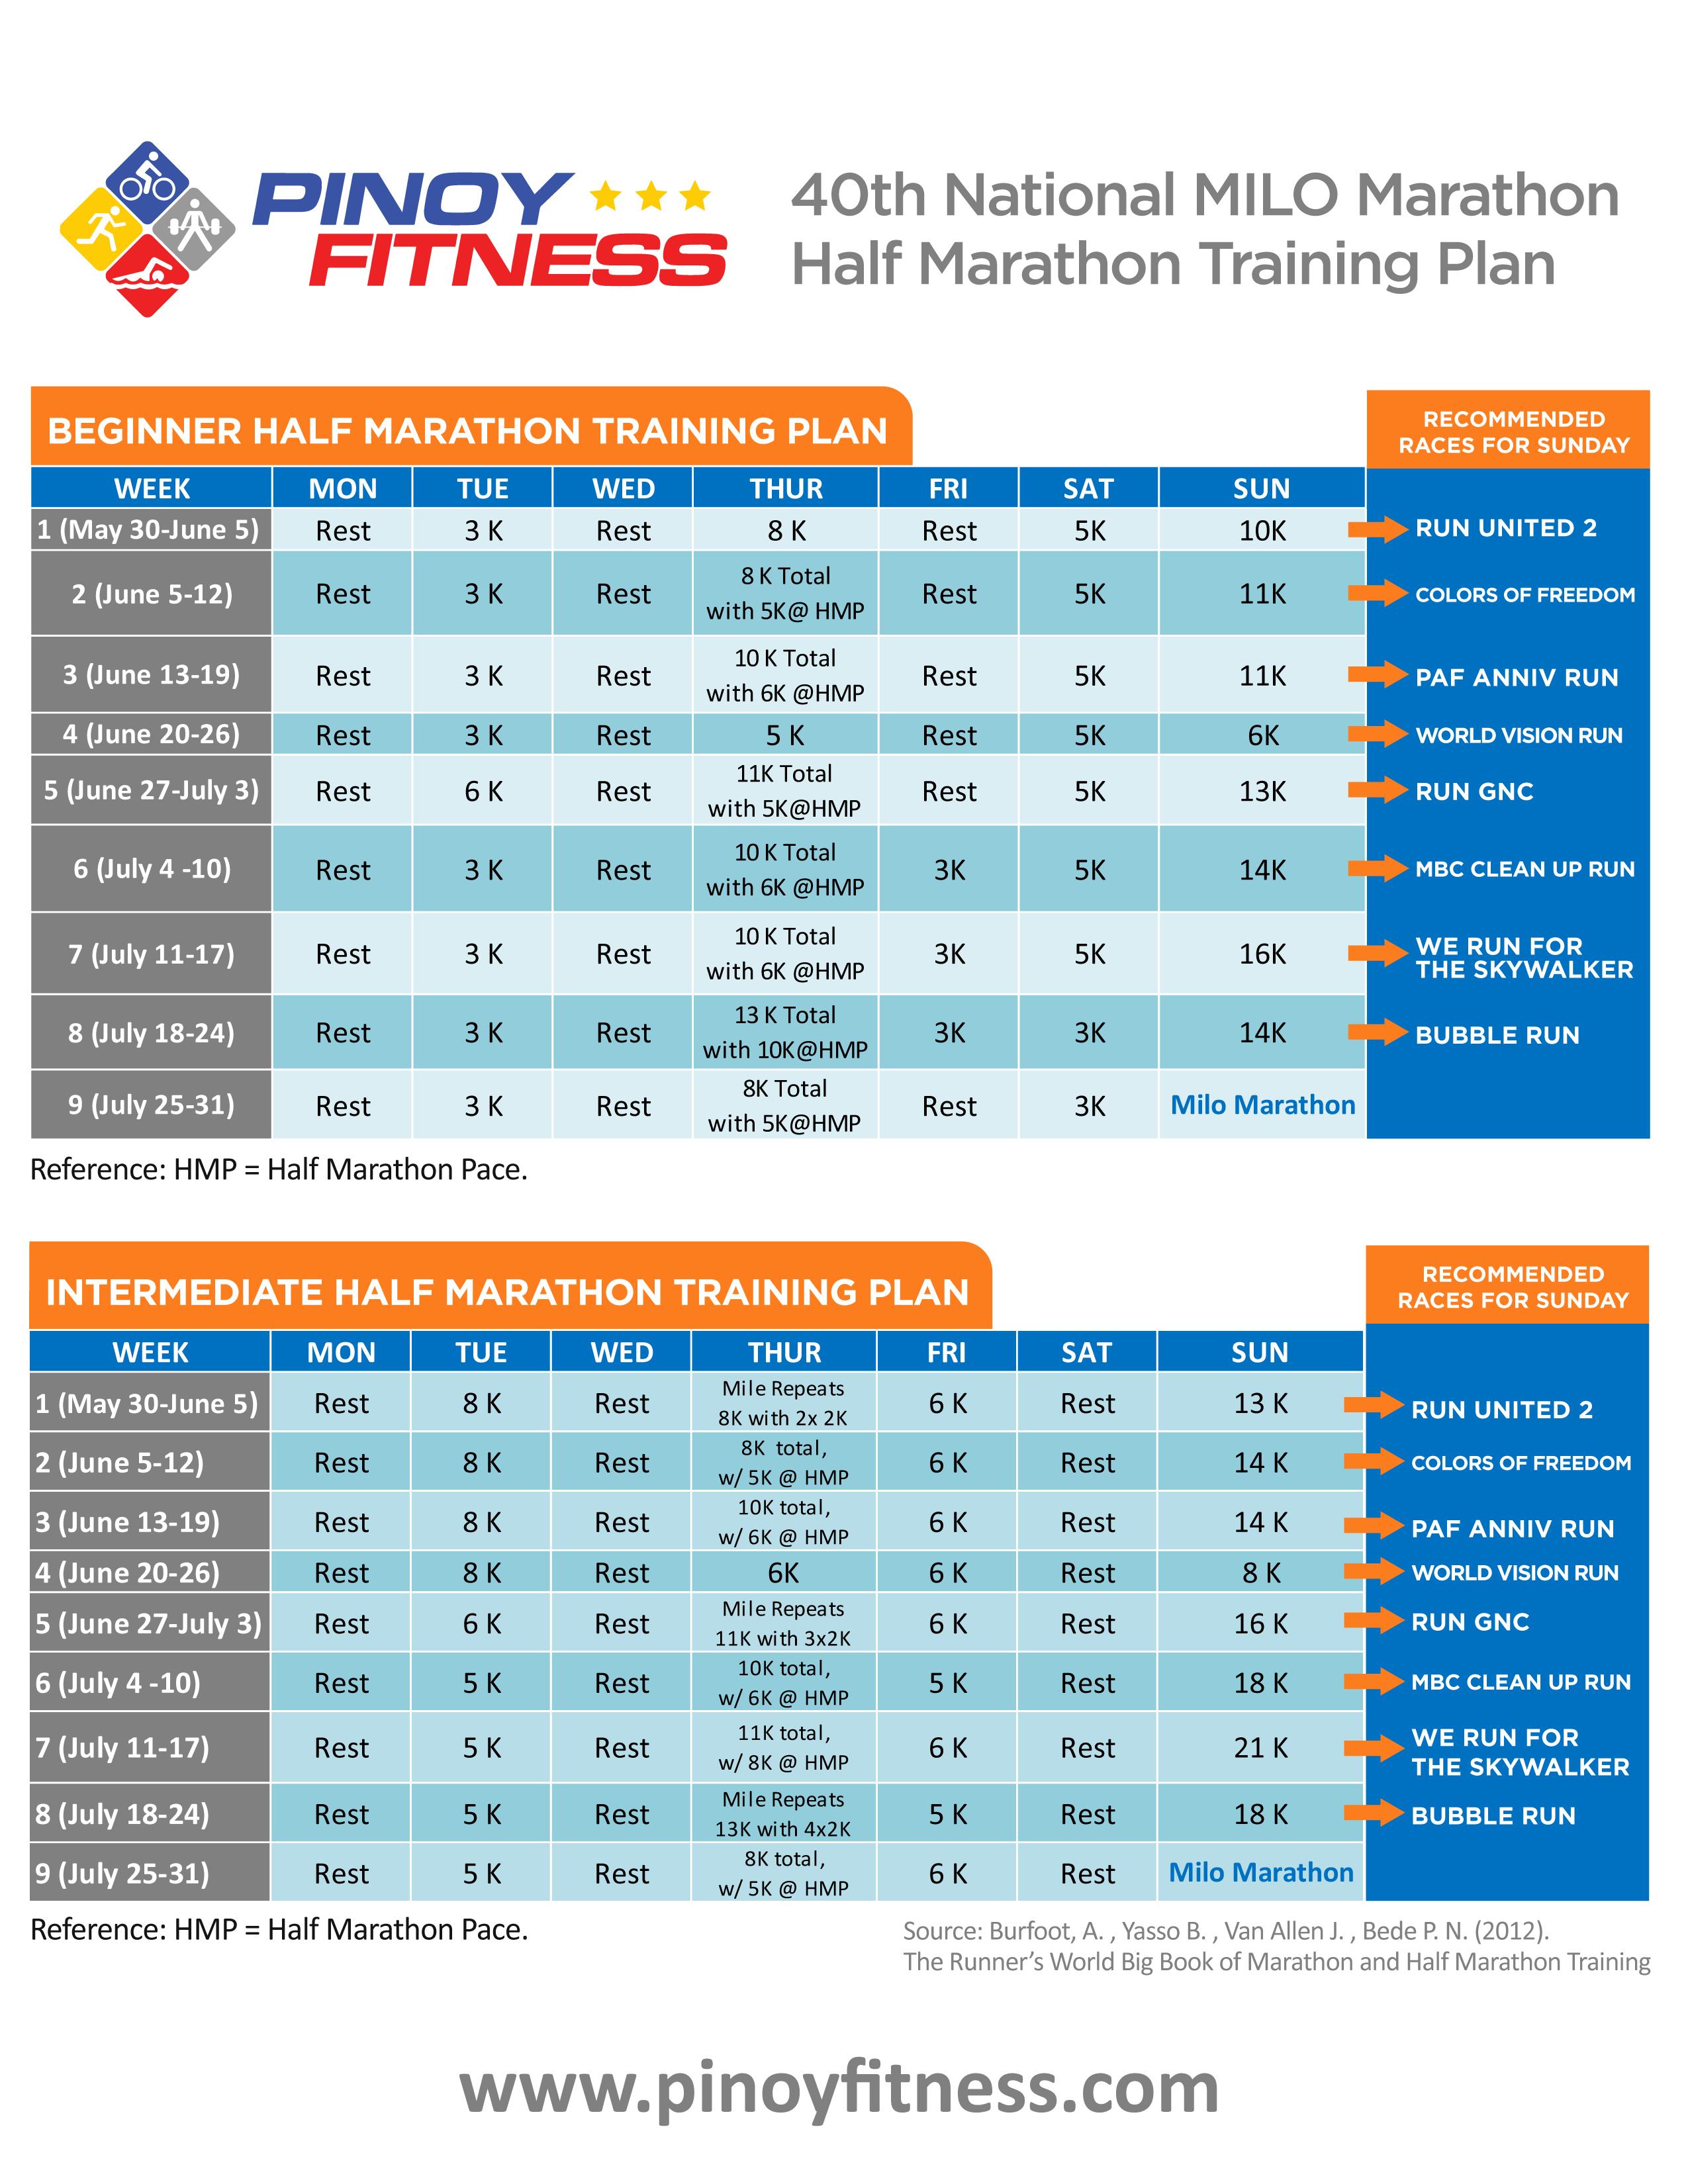 Pf Milo Half Marathon Training Plan 2016 Pinoy Fitness